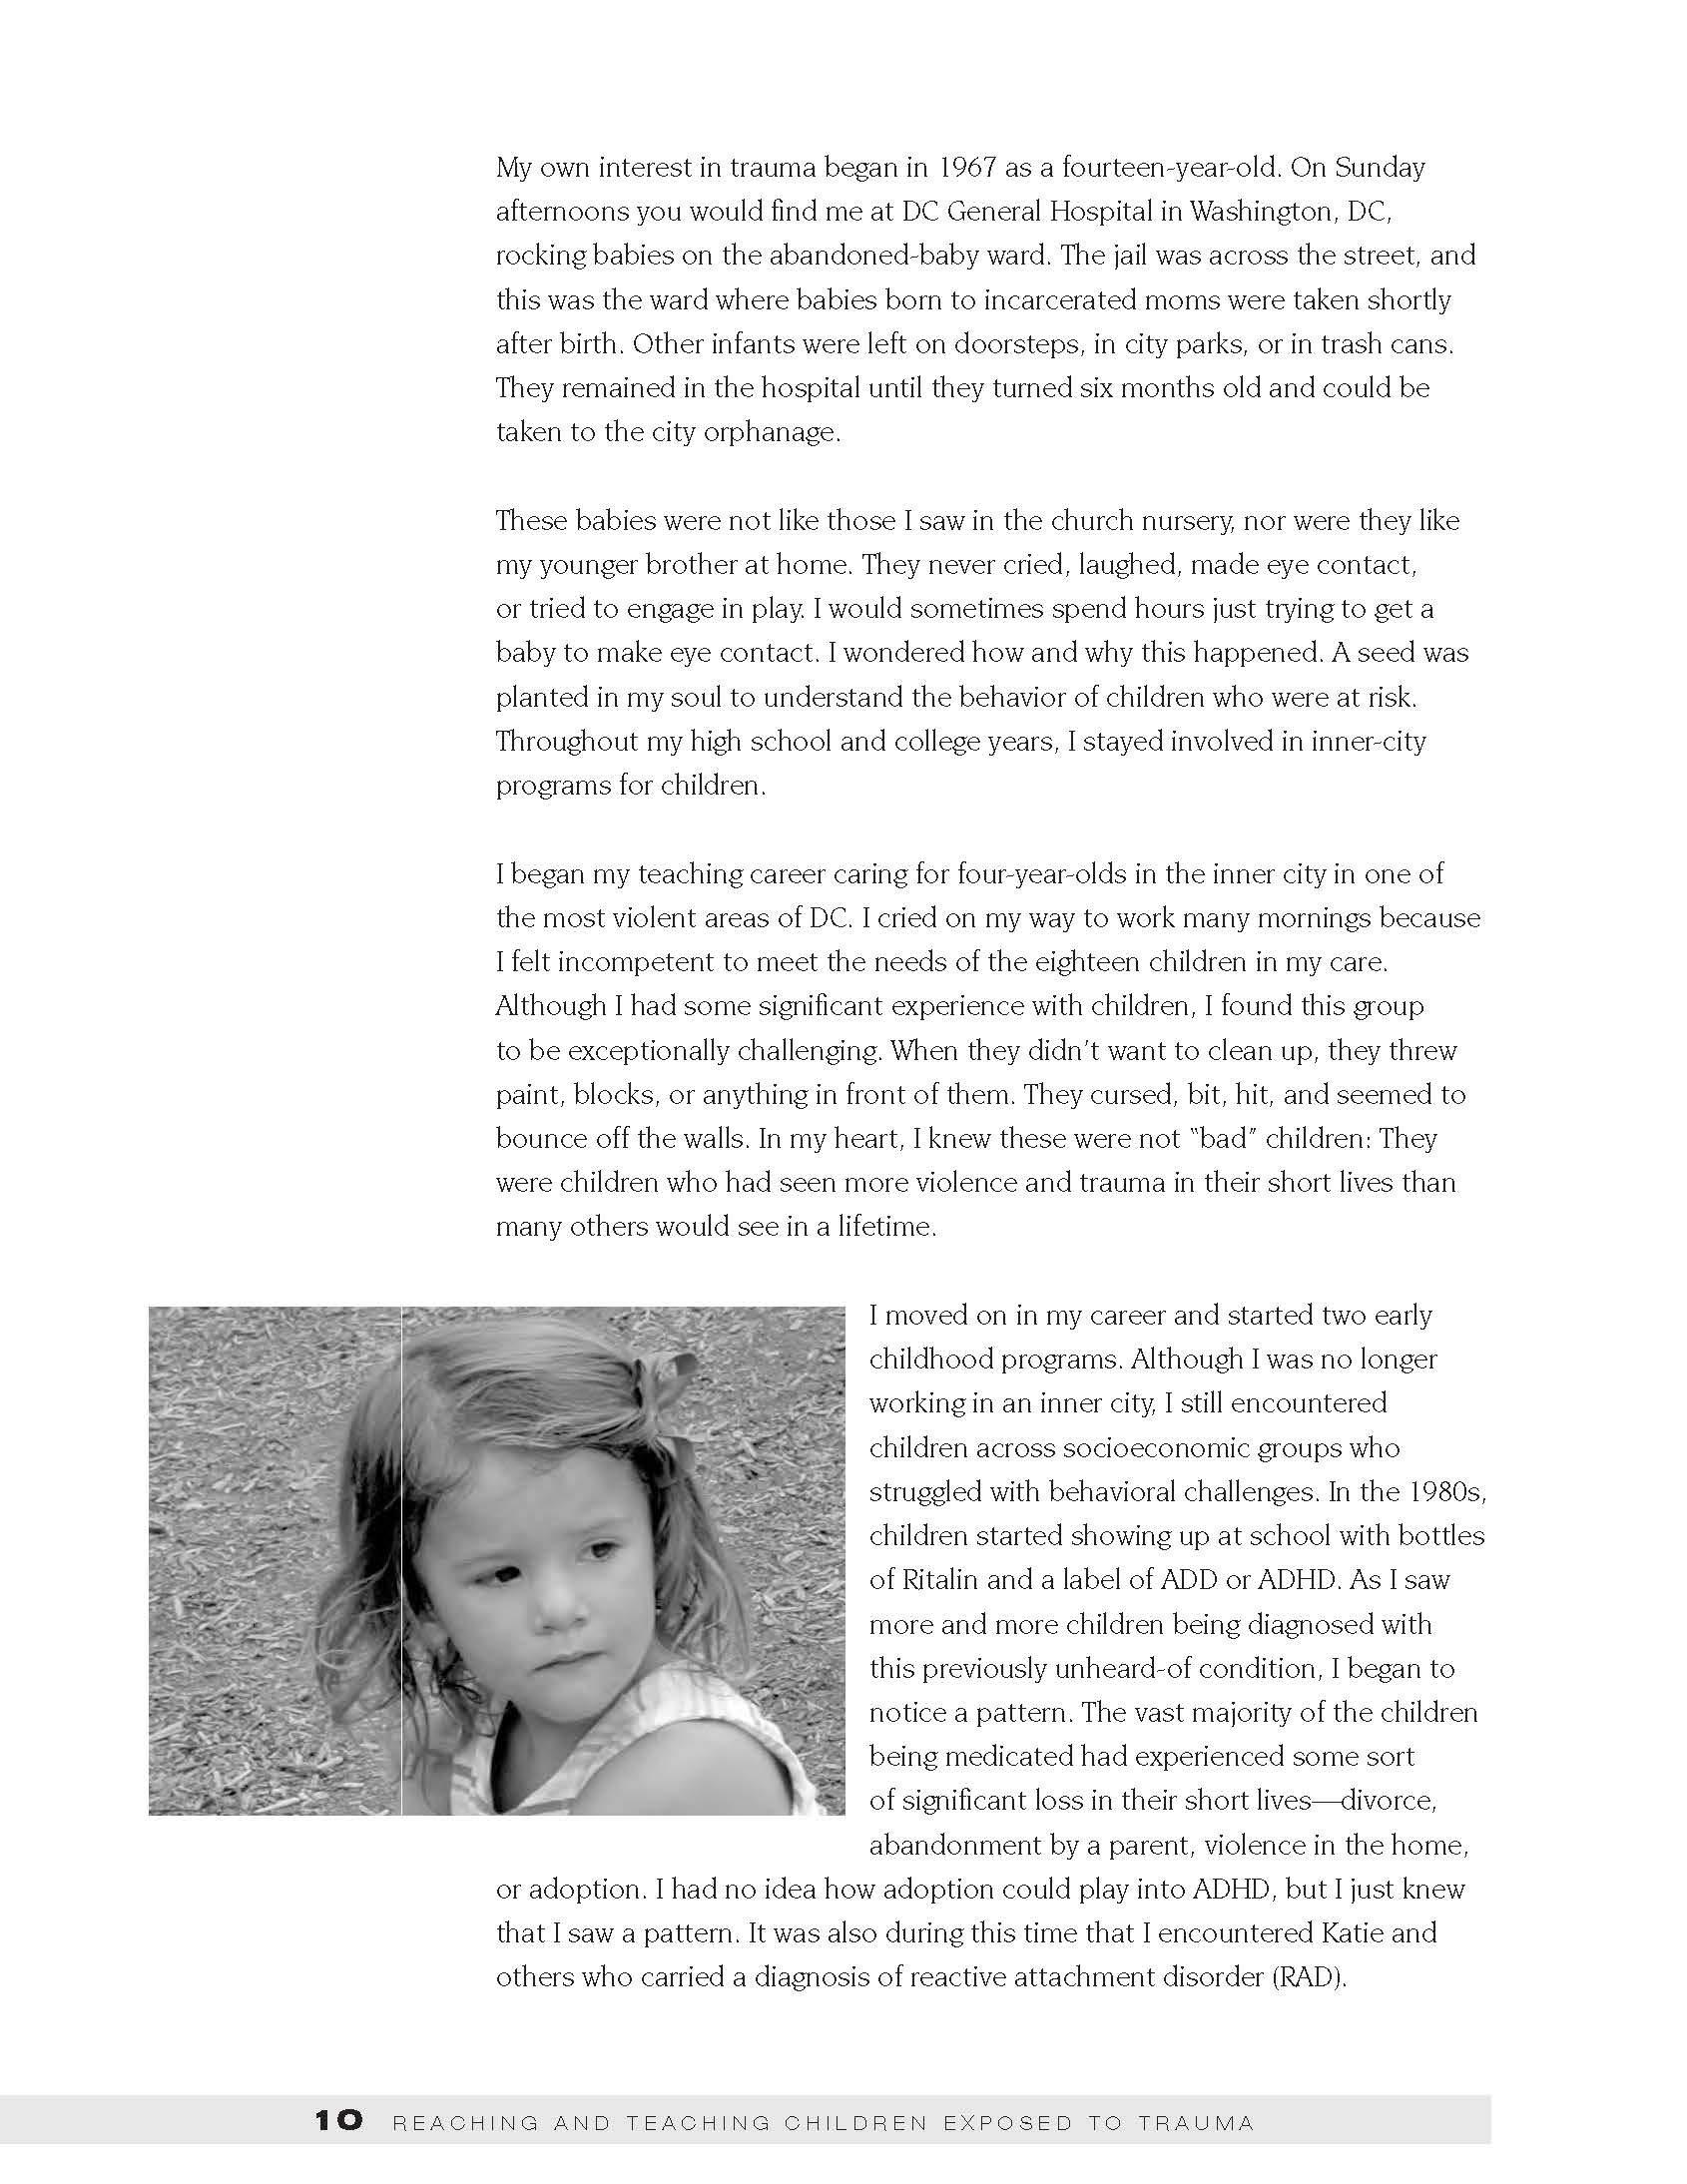 Teaching Traumatized Kids >> Reaching Teaching Children Exposed To Trauma Barbara Sorrels